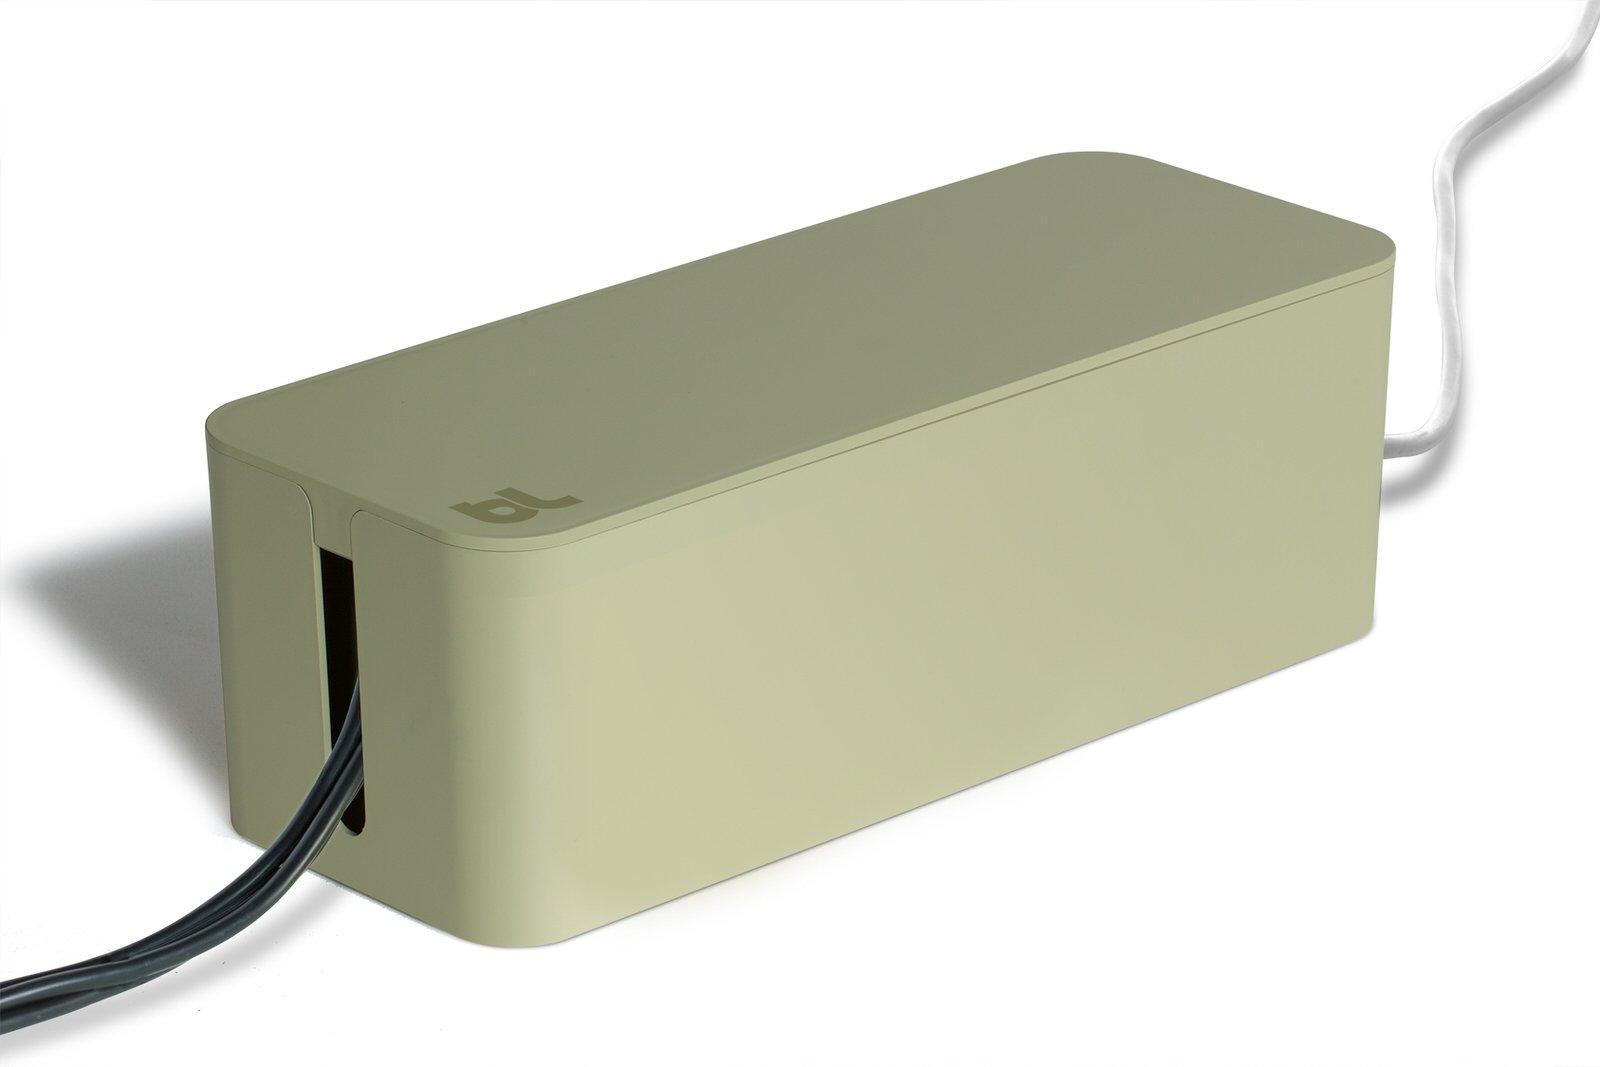 Bluelounge CableBox - Cable Management System - Light Sage - BLUCB-01-LS